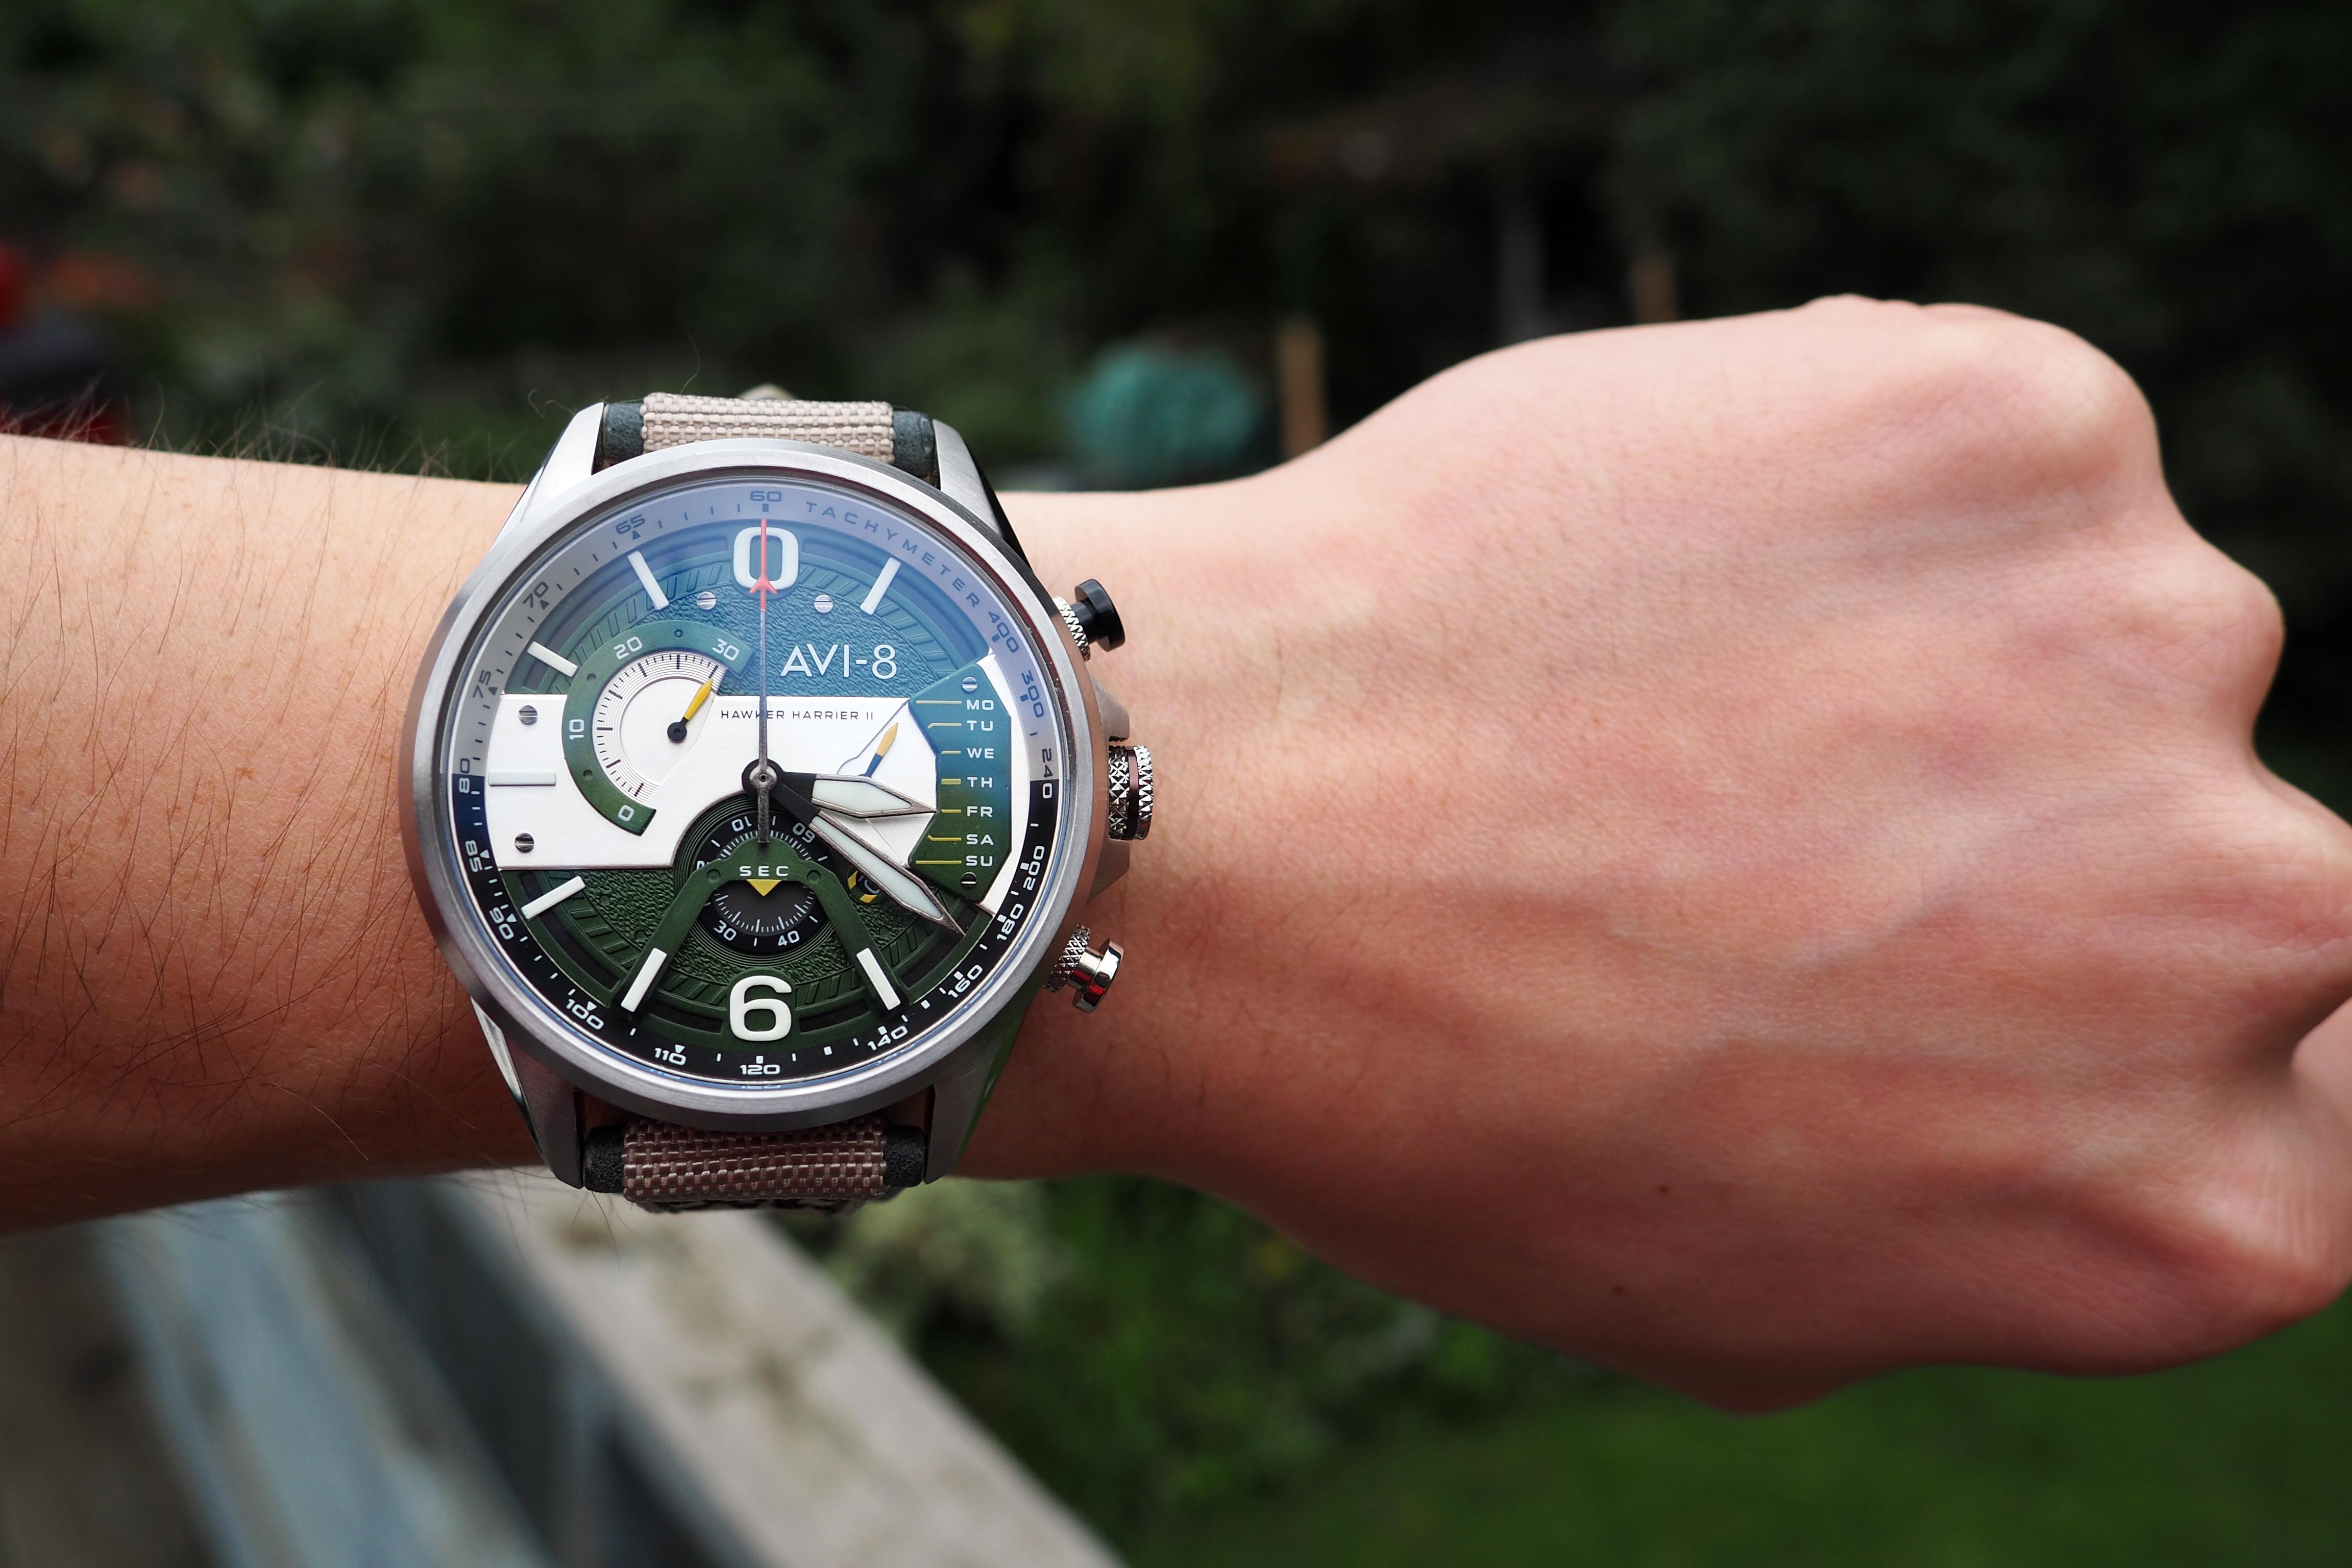 avi-8 on the wrist